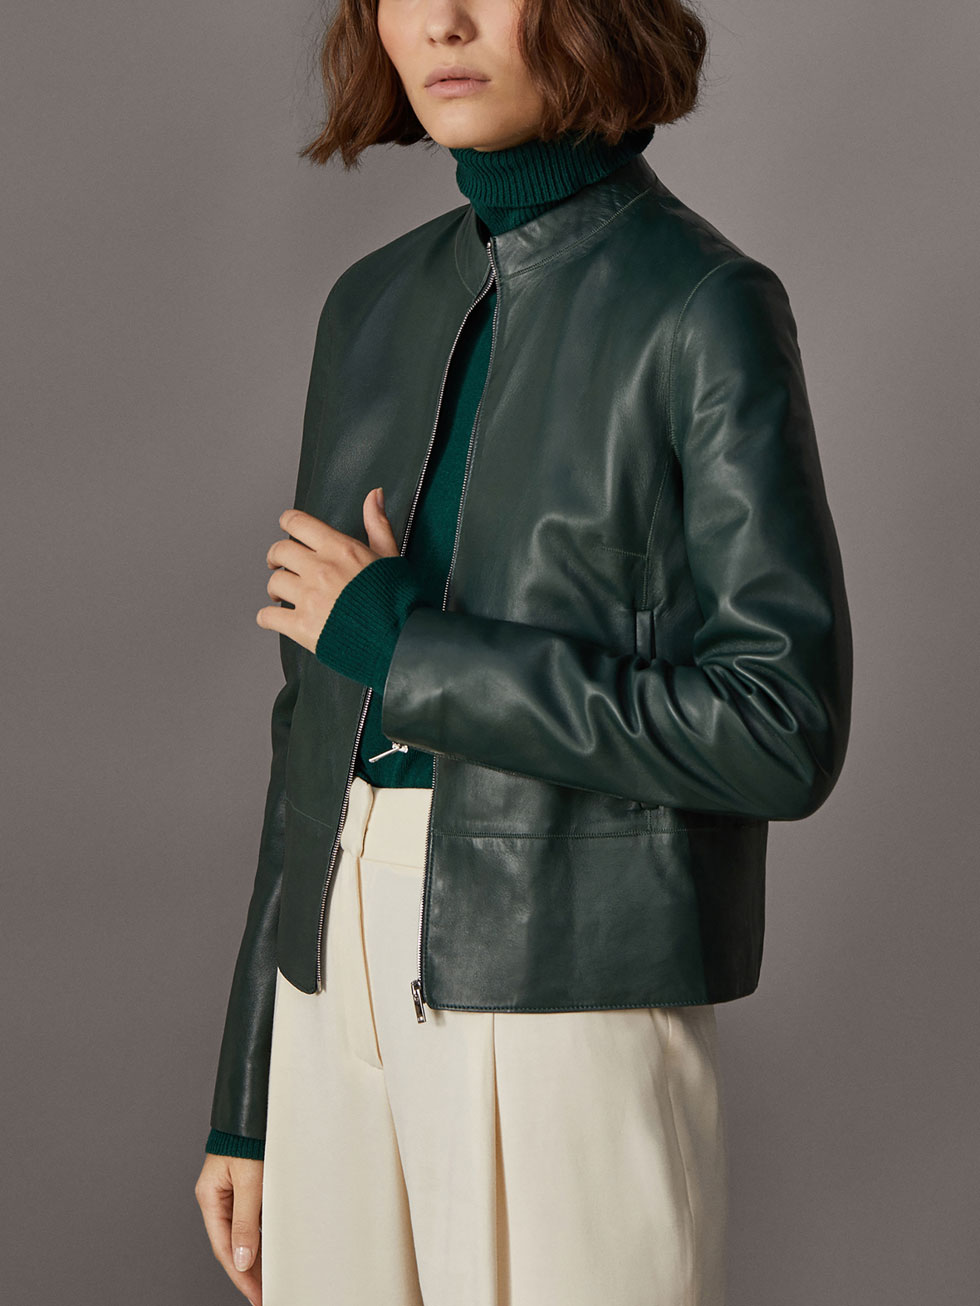 Buy green leather jacket